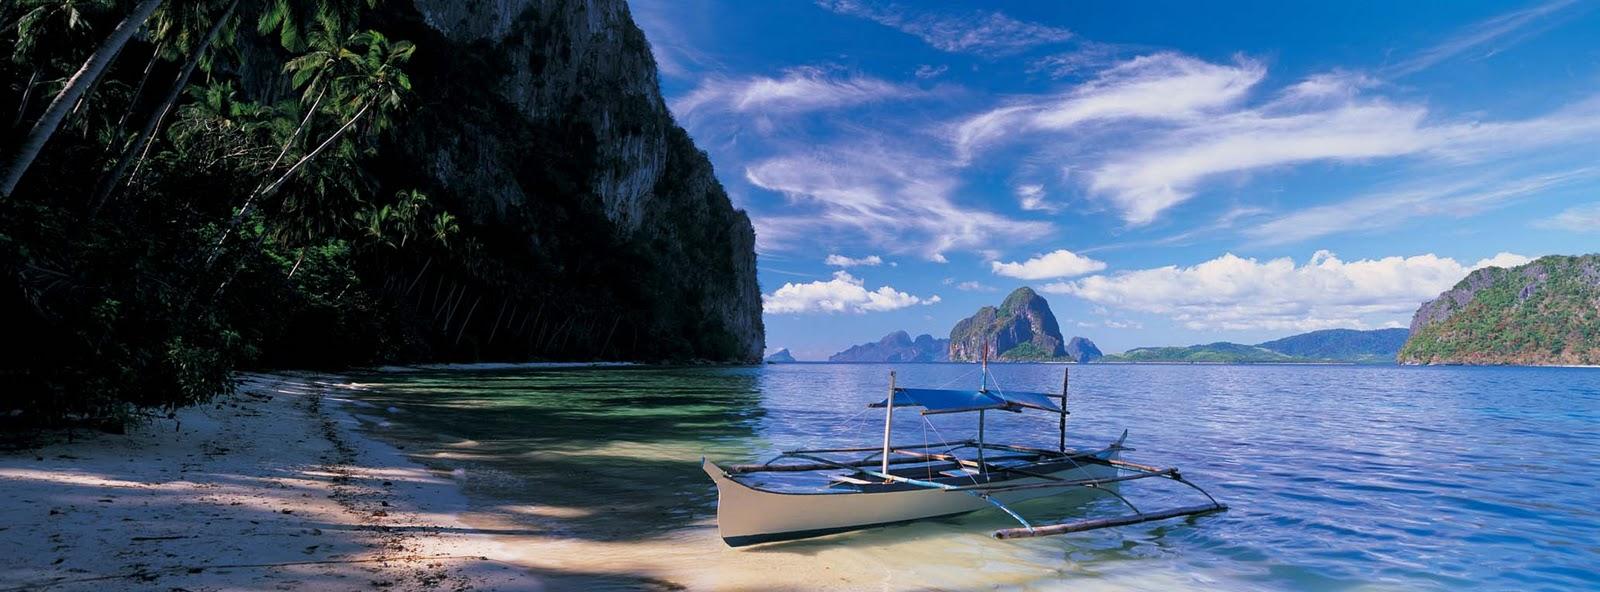 Palawan Island DX News DU1/EA3NT